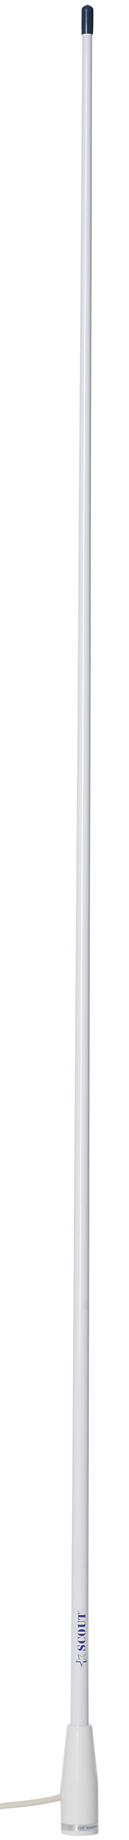 wassersport ukw antenne scout glasfaser online kaufen. Black Bedroom Furniture Sets. Home Design Ideas